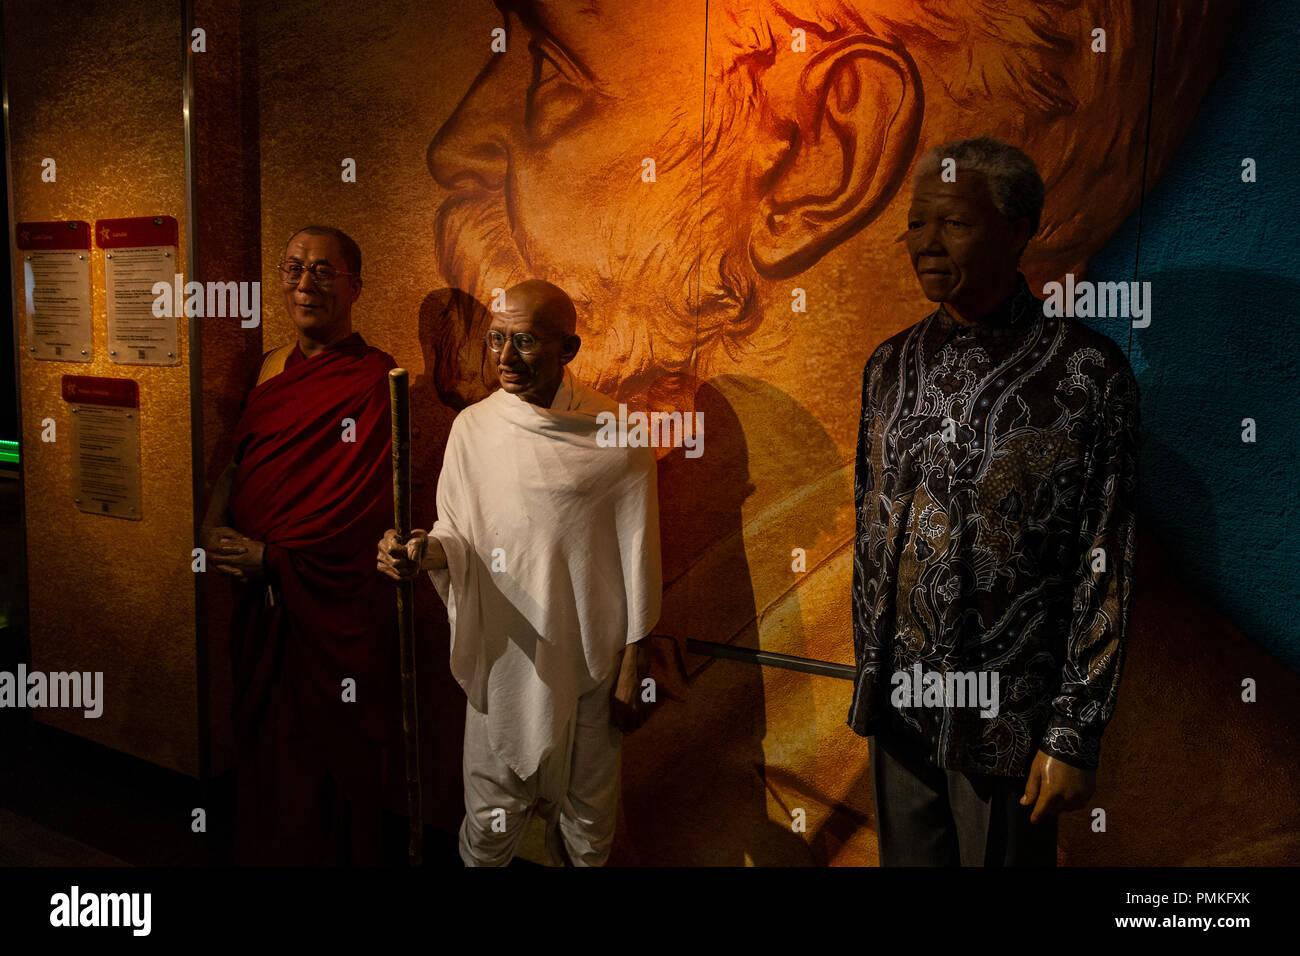 Mahatma Gandhi, Dalai Lama and Nelson Mandela in wax at the Madame Tussauds Wax Museum. Asmterdam, Netherlands - Stock Image